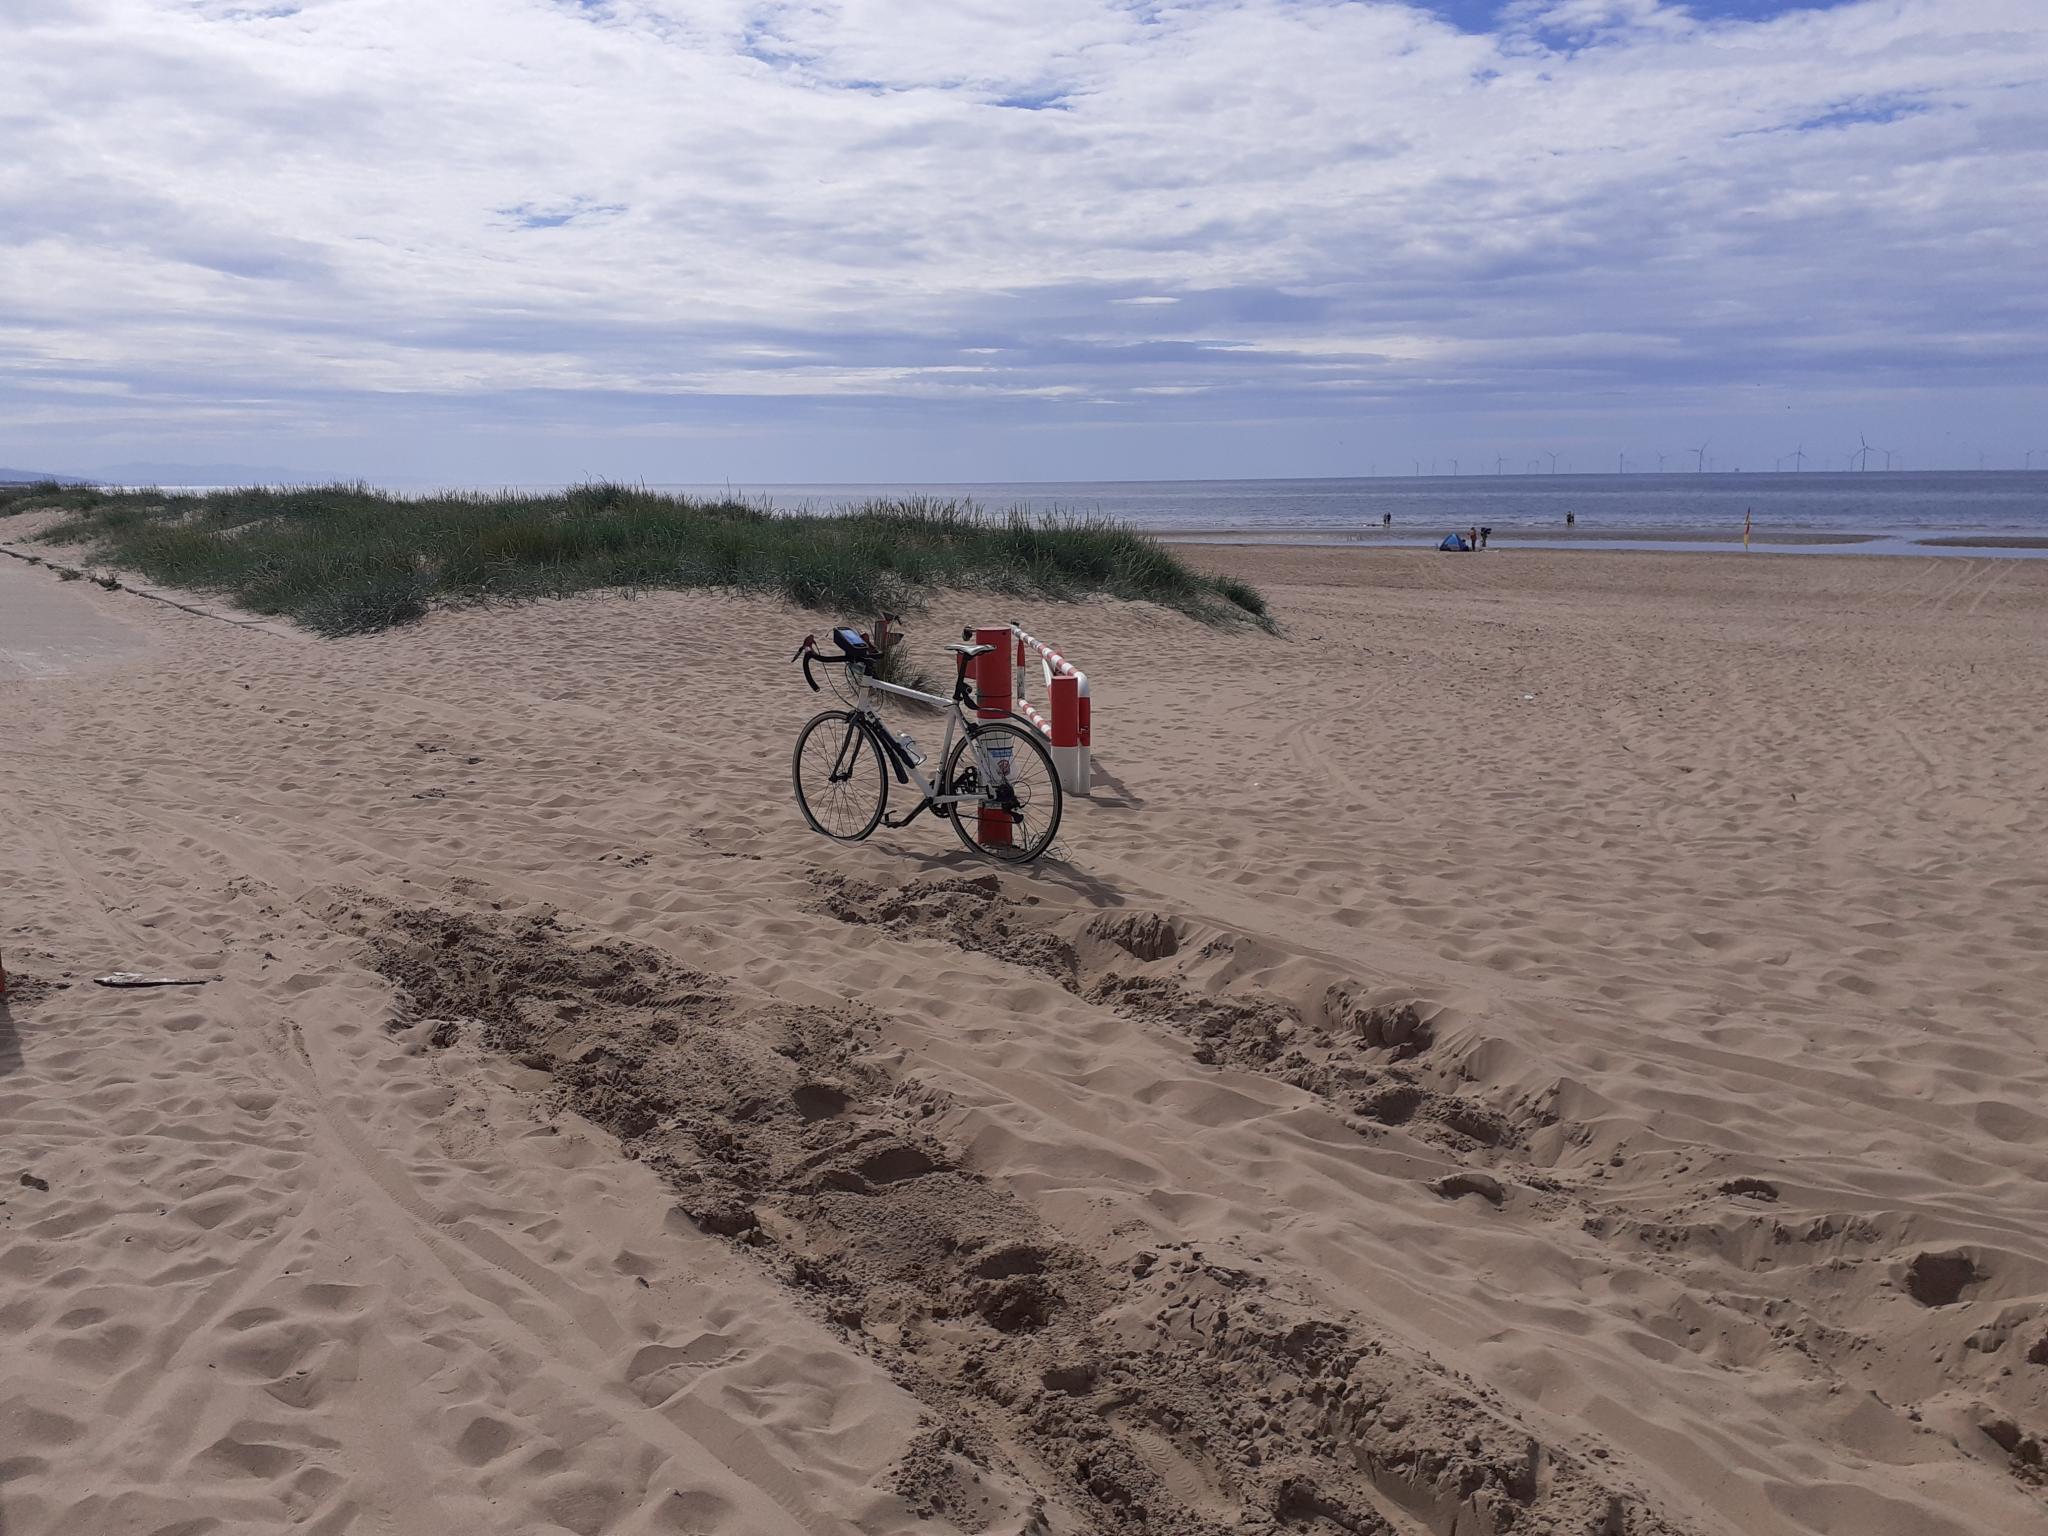 On my bike-20210615_153815-jpg